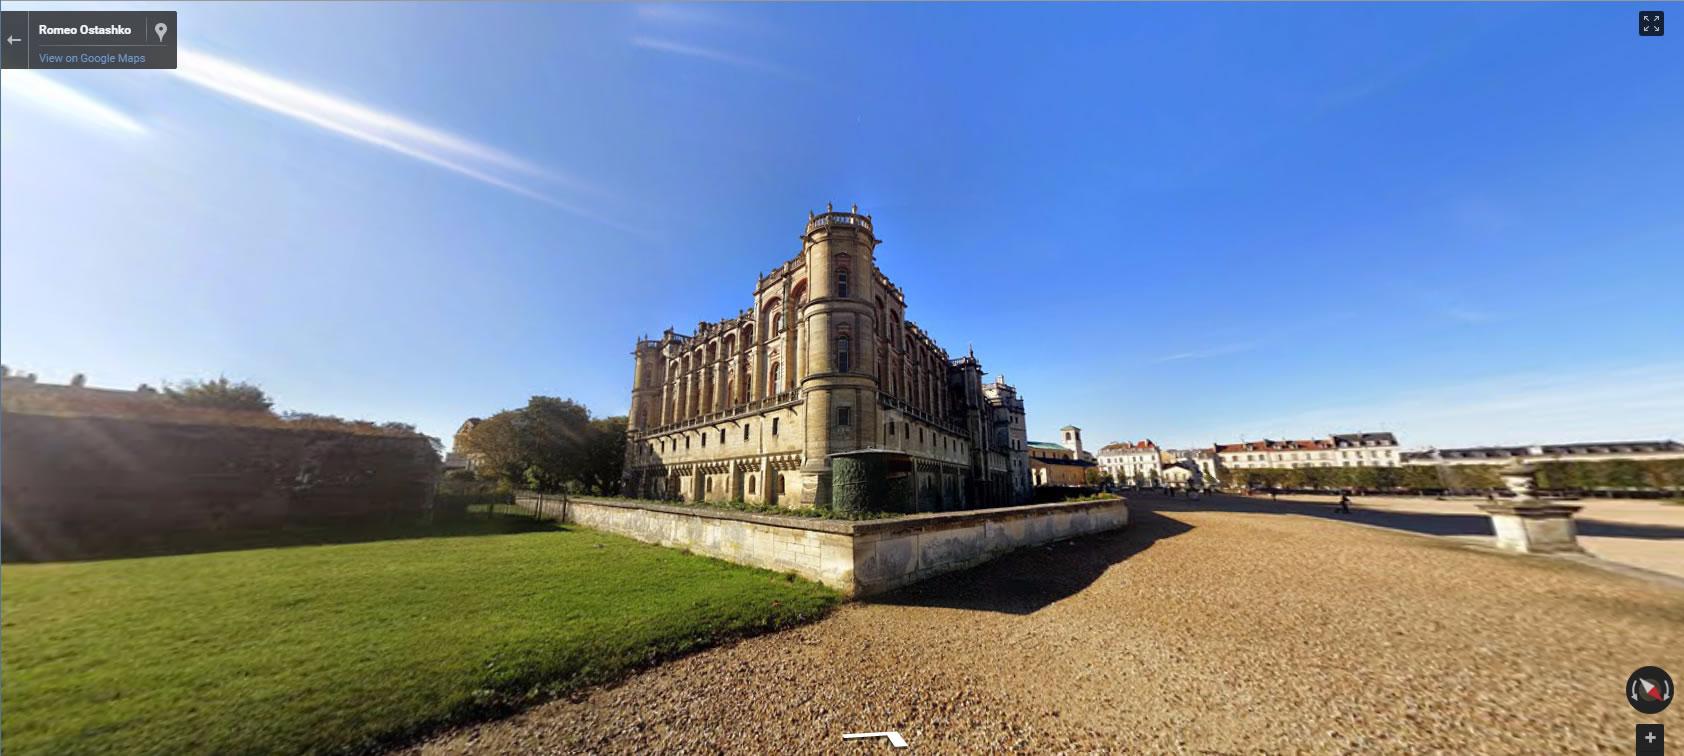 Chateau-de-Saint-Germain-en-Laye.jpg (1684×756)